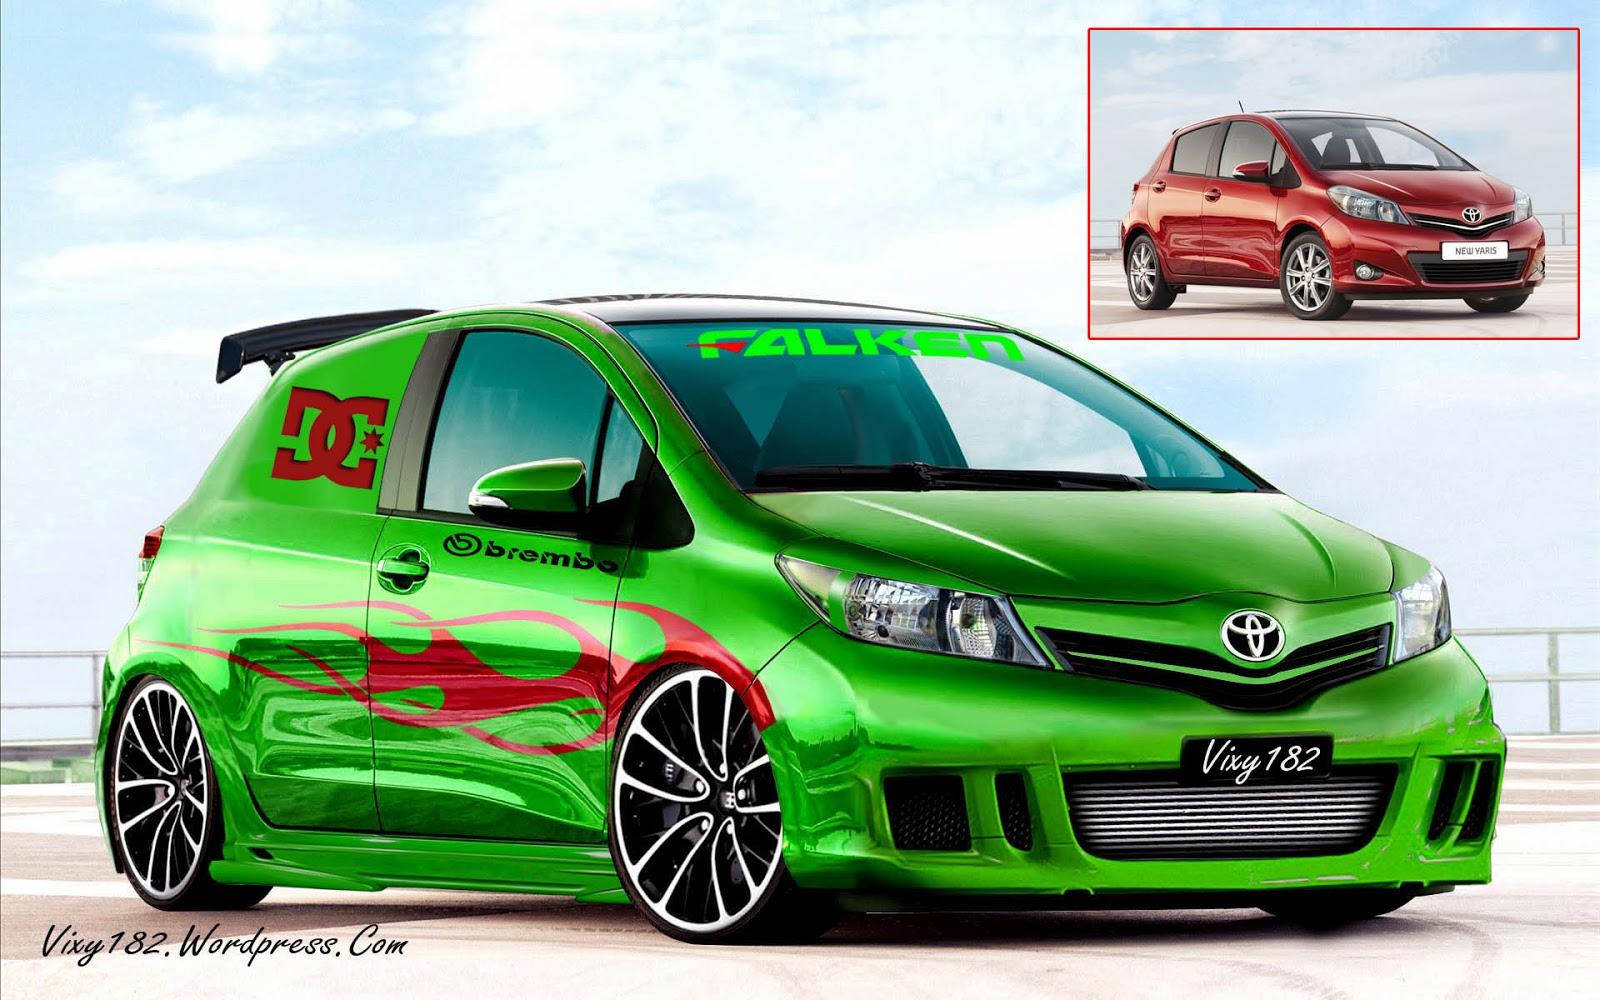 Modifikasi Yaris Foto Modif Toyota Yaris Jdm Modifikasi